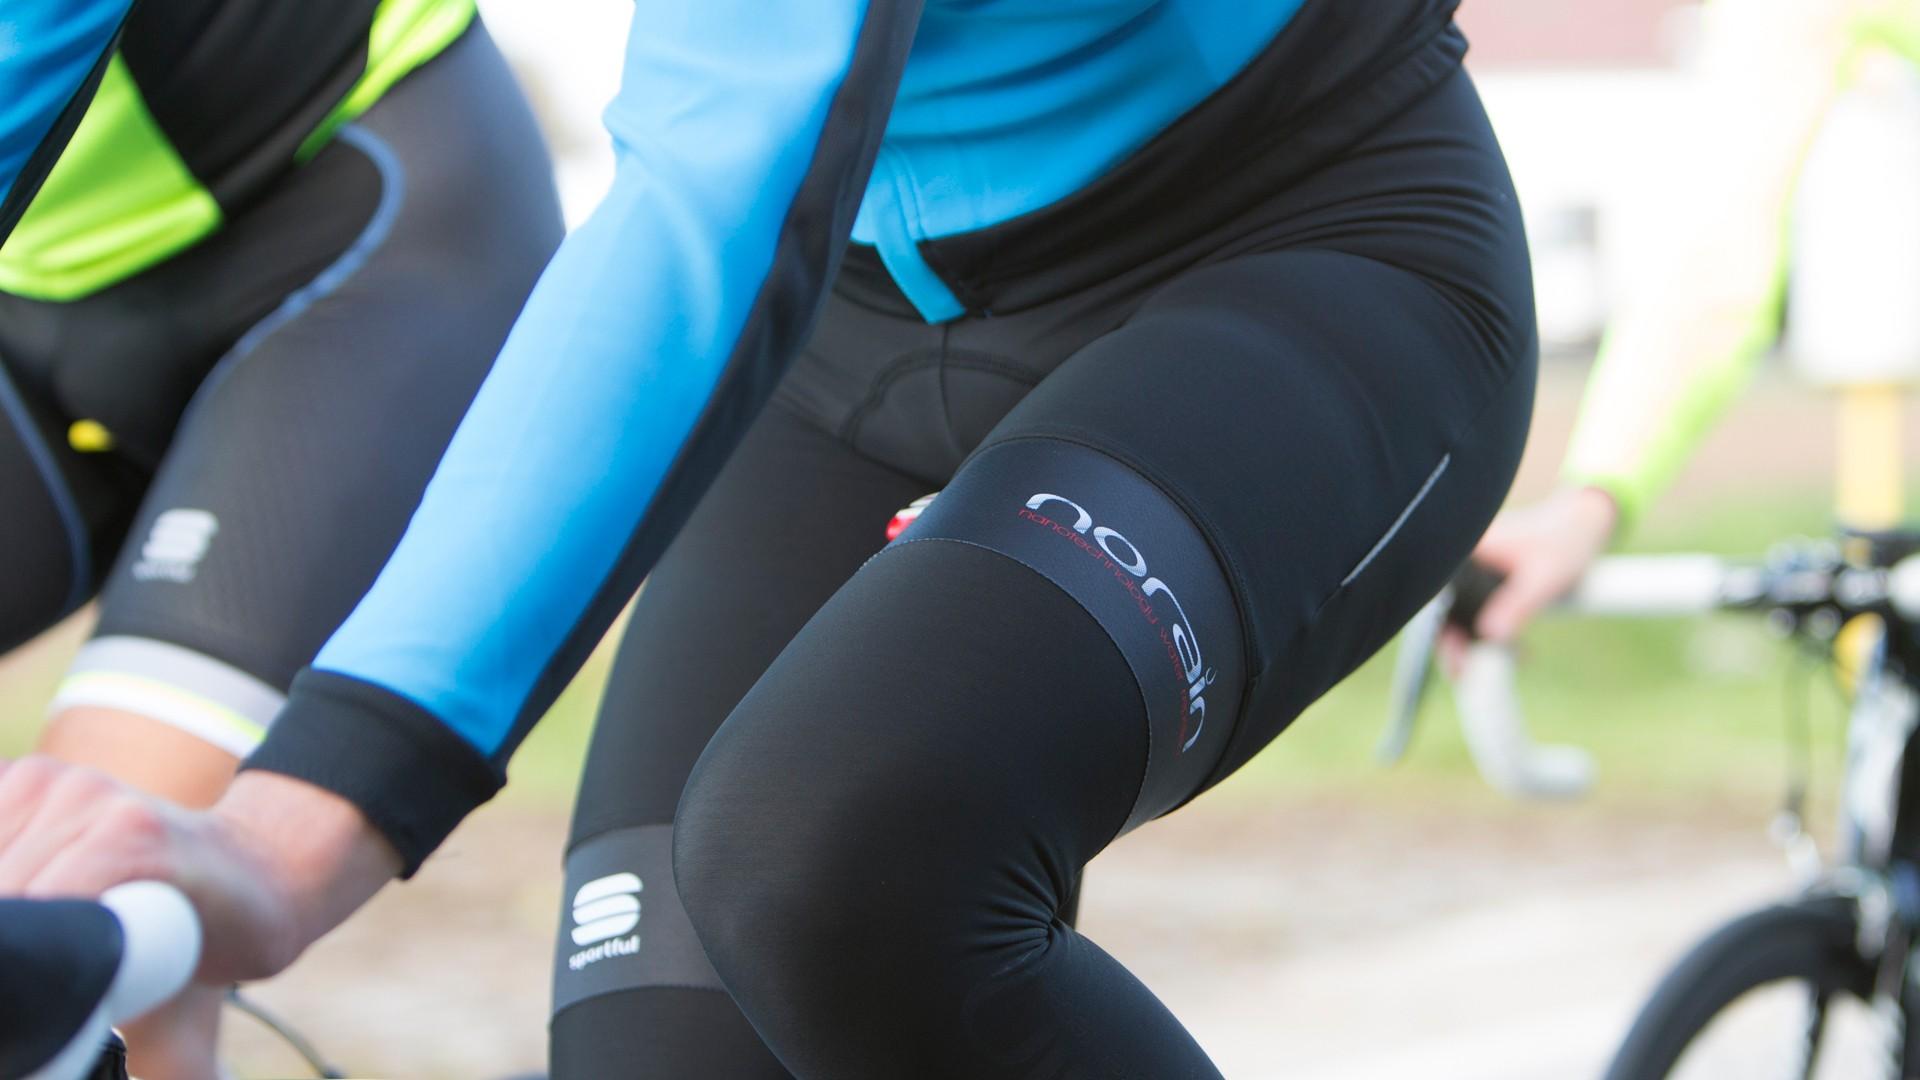 The Fiandre No-rain bib short has a special waterproof treatment